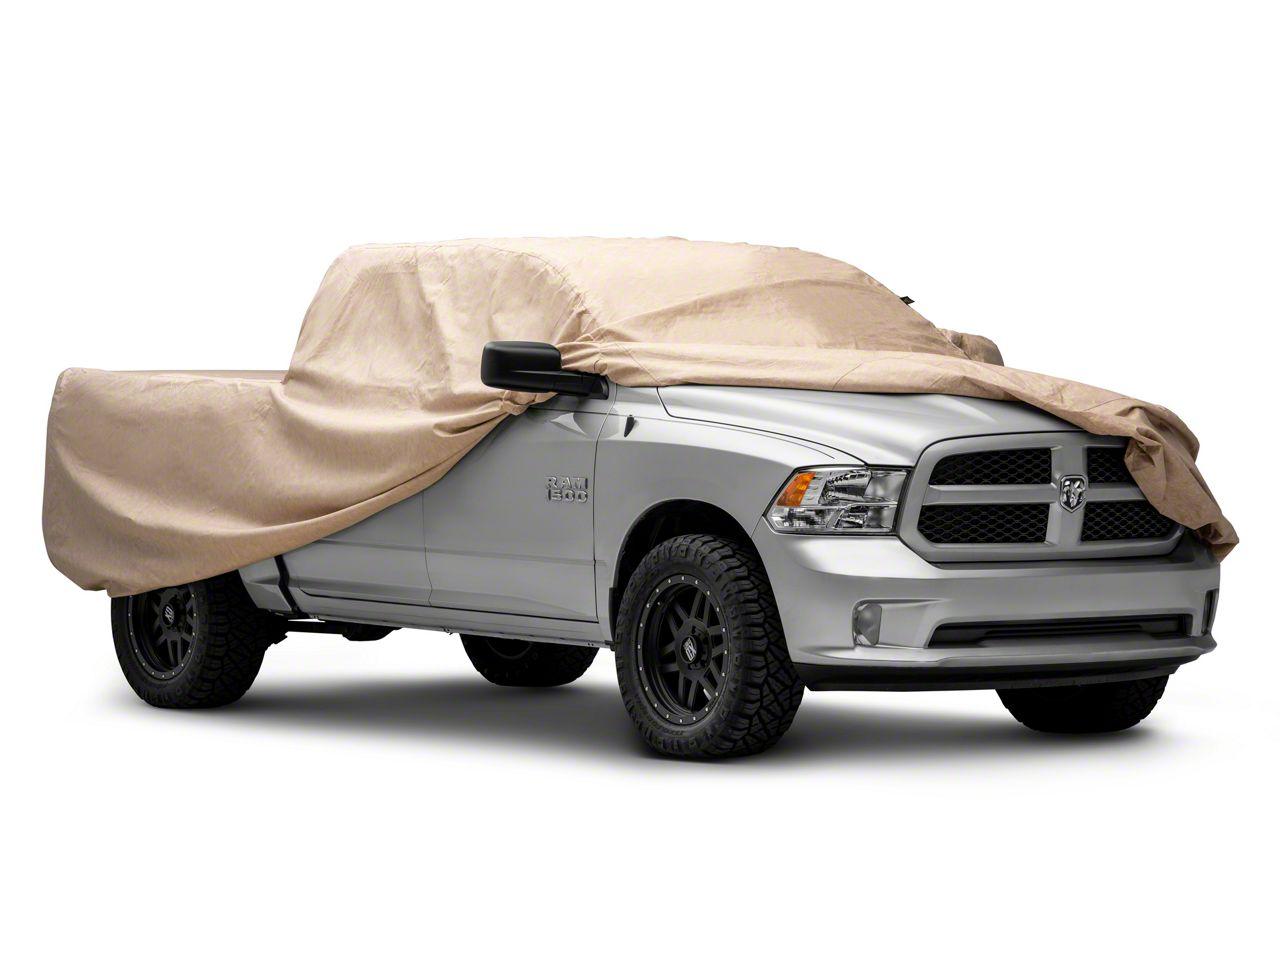 Covercraft Custom Block-it 380 Truck Cover - Taupe (02-18 RAM 1500)